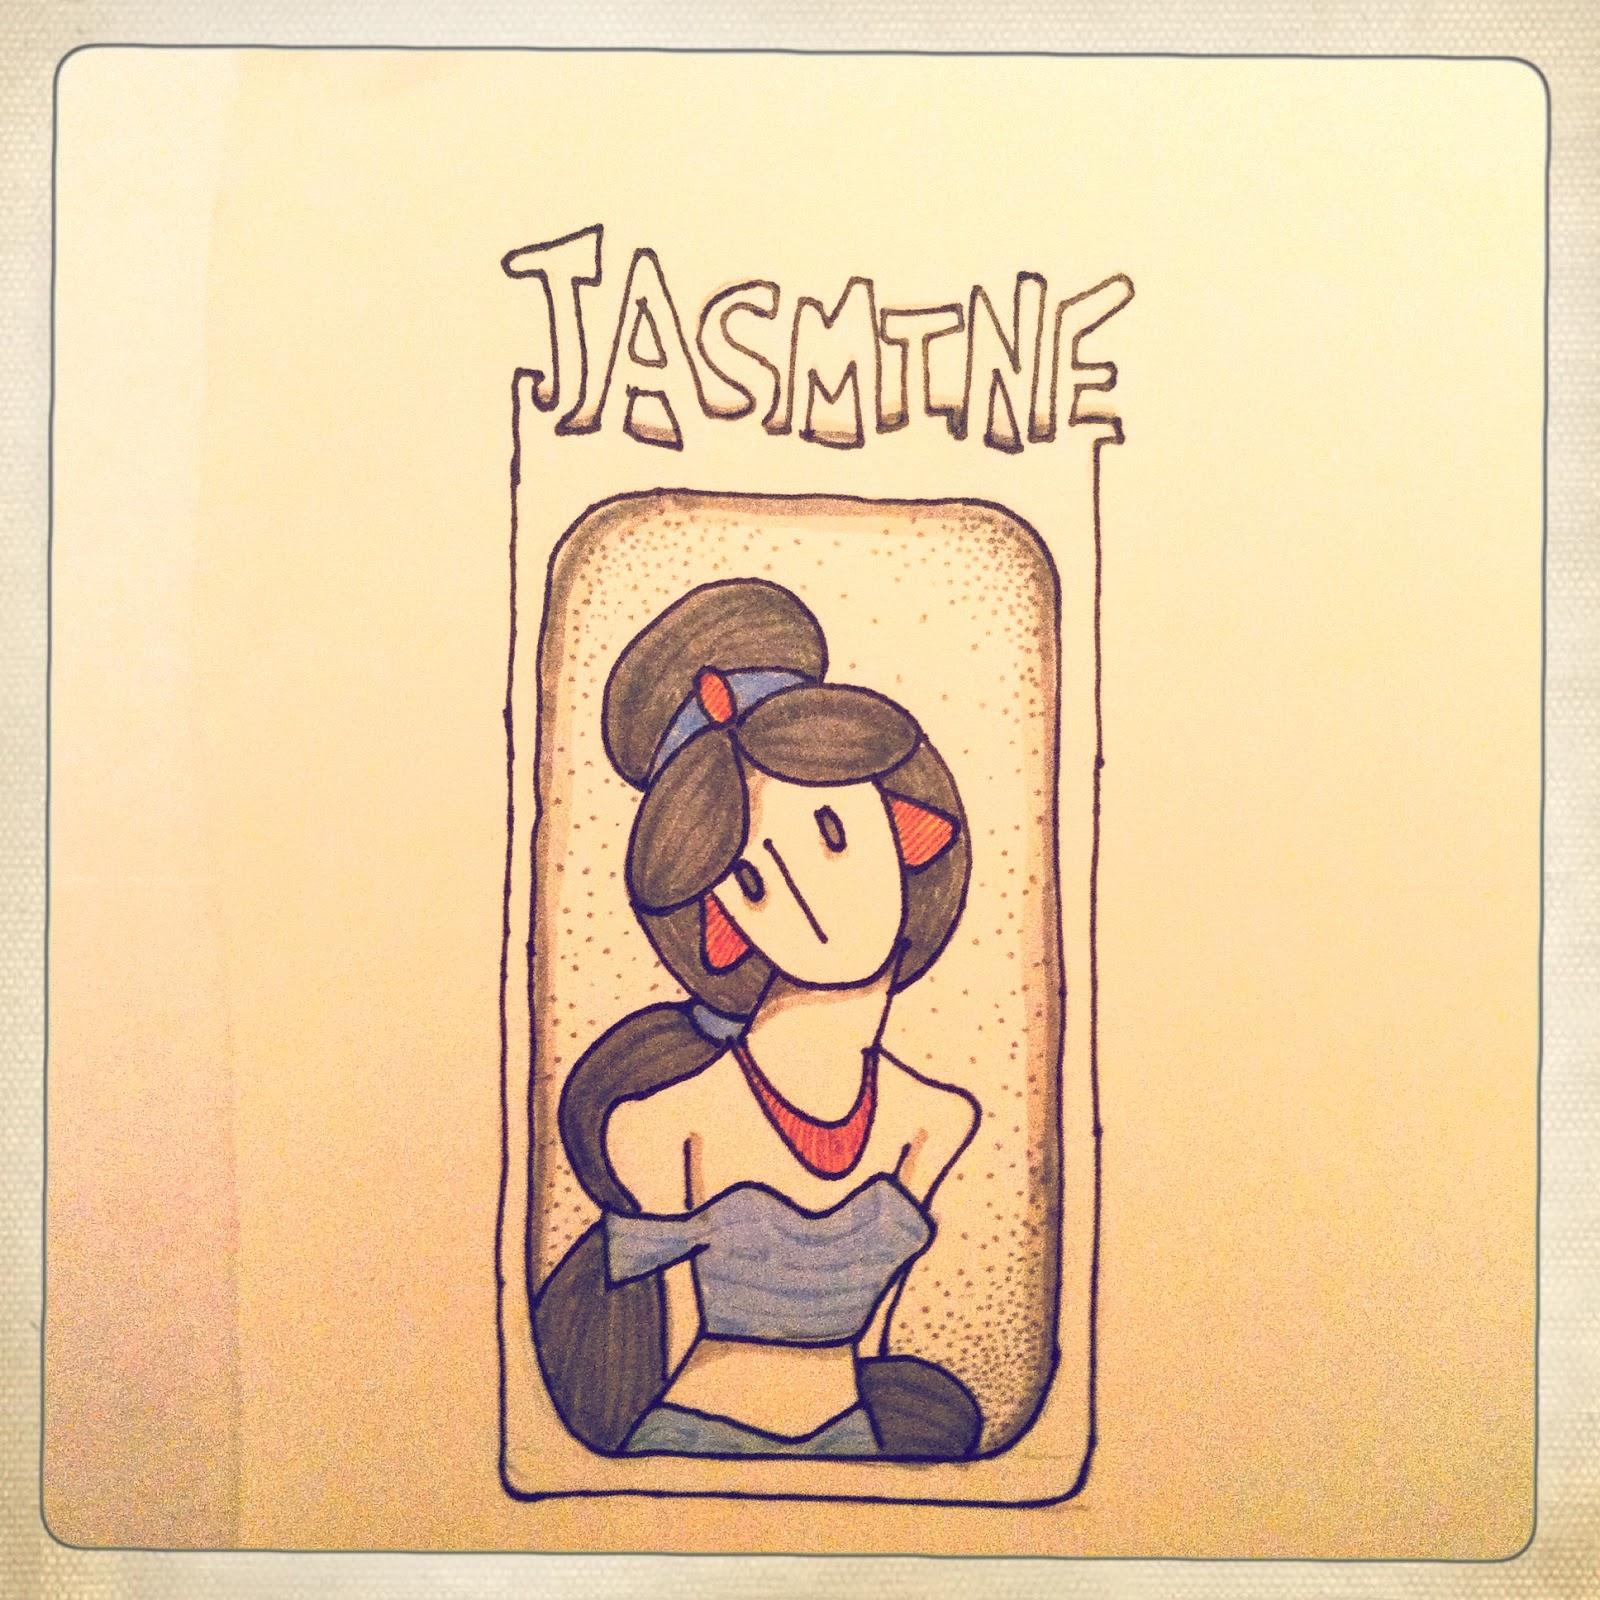 Disney Hipster Blog: A Couple Disney Princess Drawings...